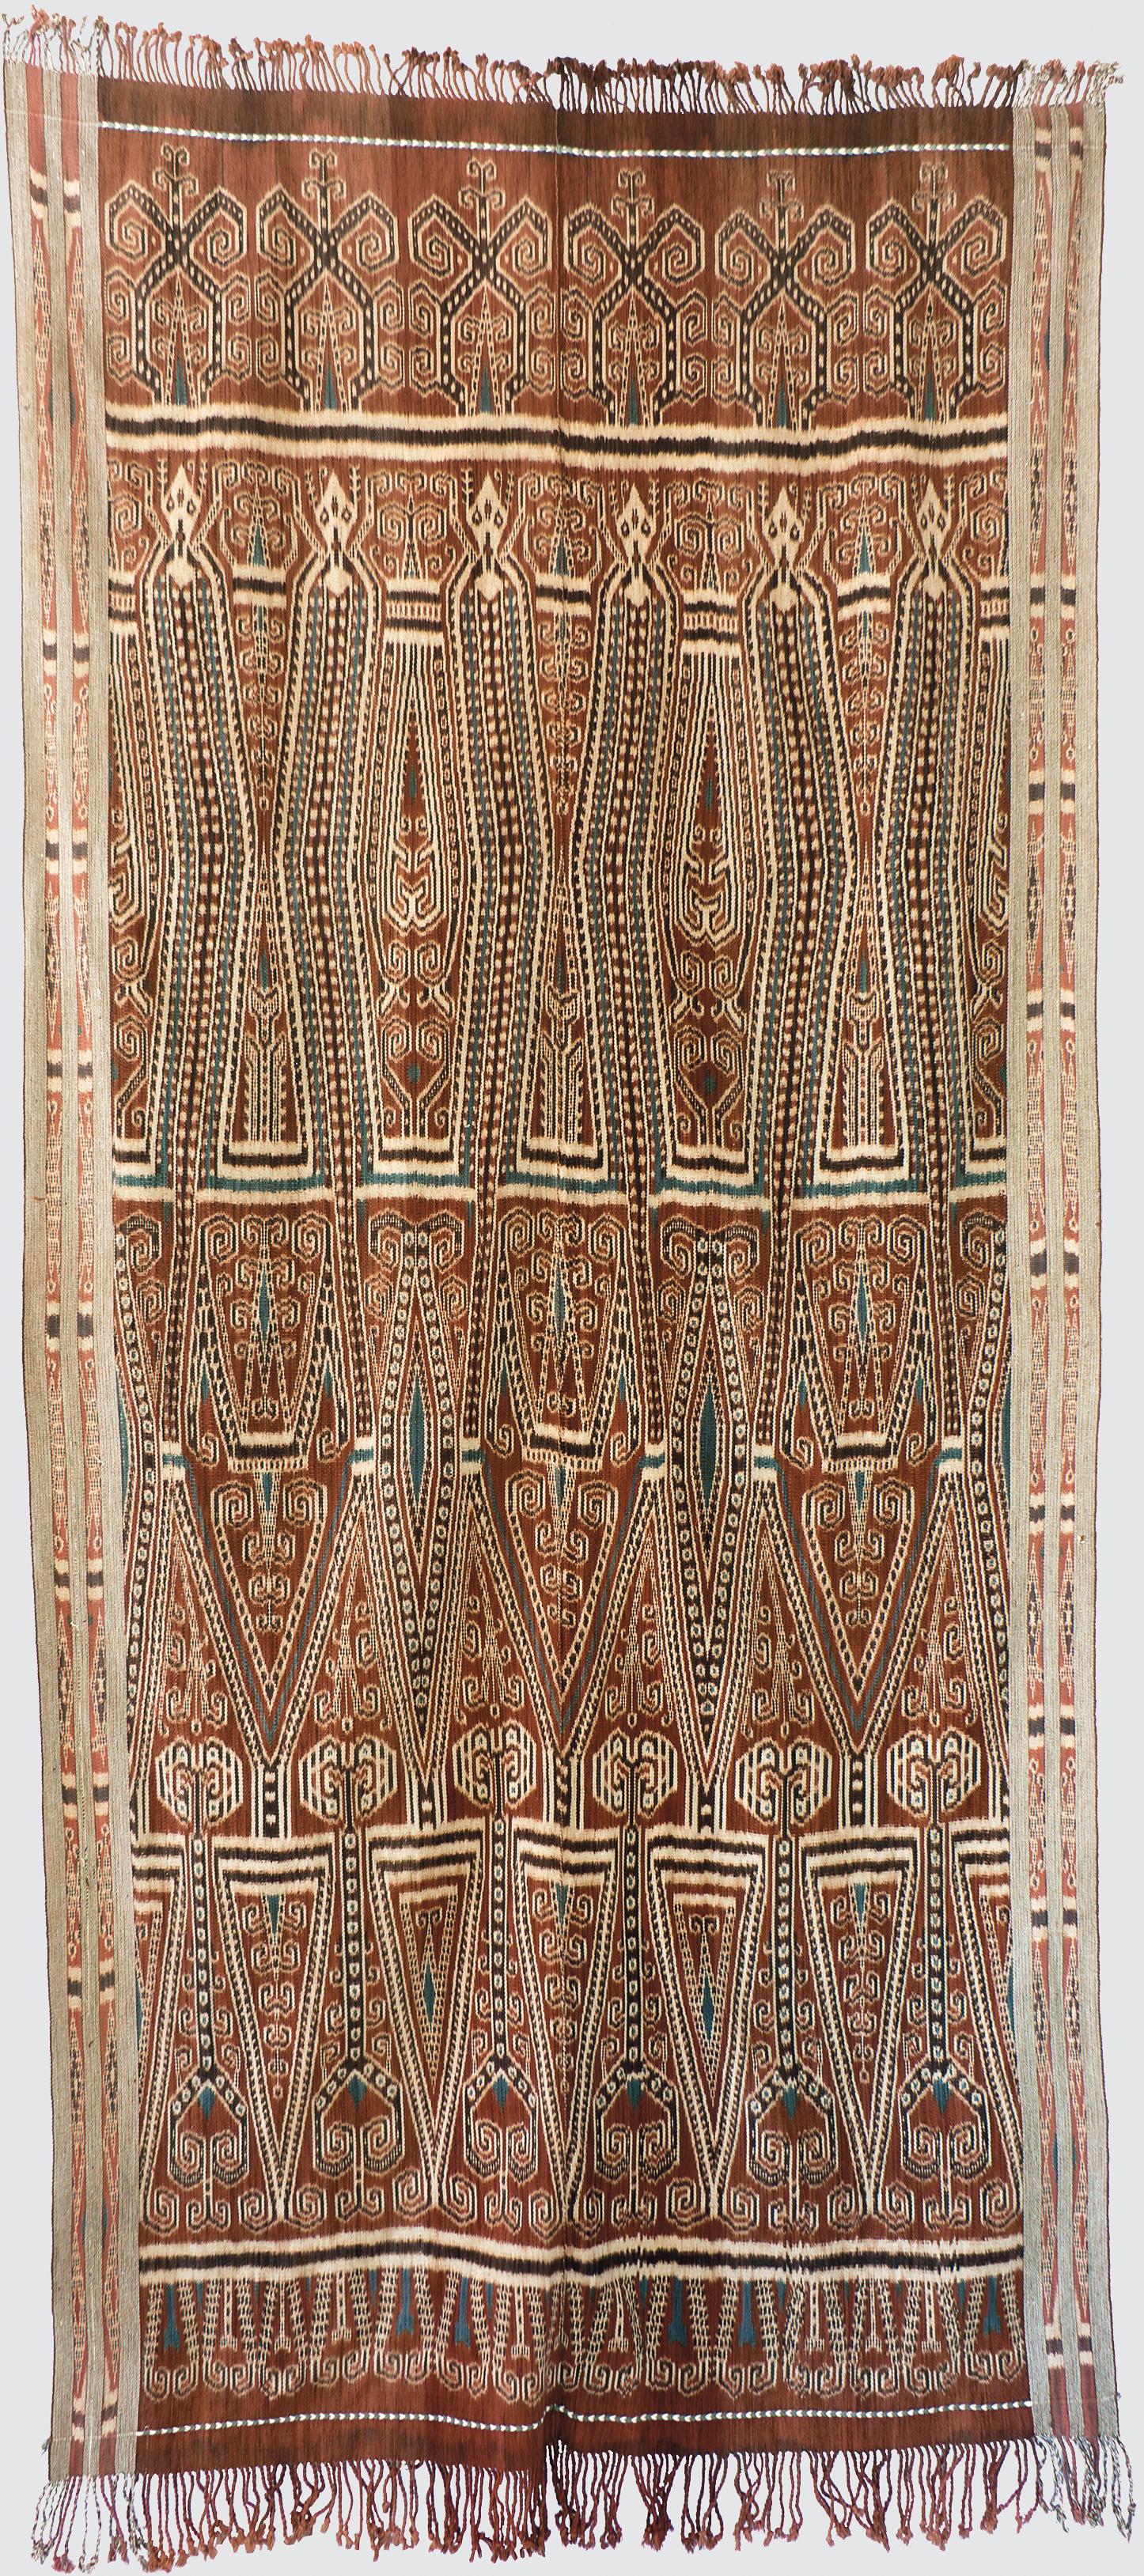 Pua Kumbu, tissu cérémoniel, 116 cm x 255 cm, coton, ikat chaîne, tissé en 2016 par Gongging ak Langkong, Rumah Gare, Kapit, Sarawak, Malaisie. Photo Rémy Prin